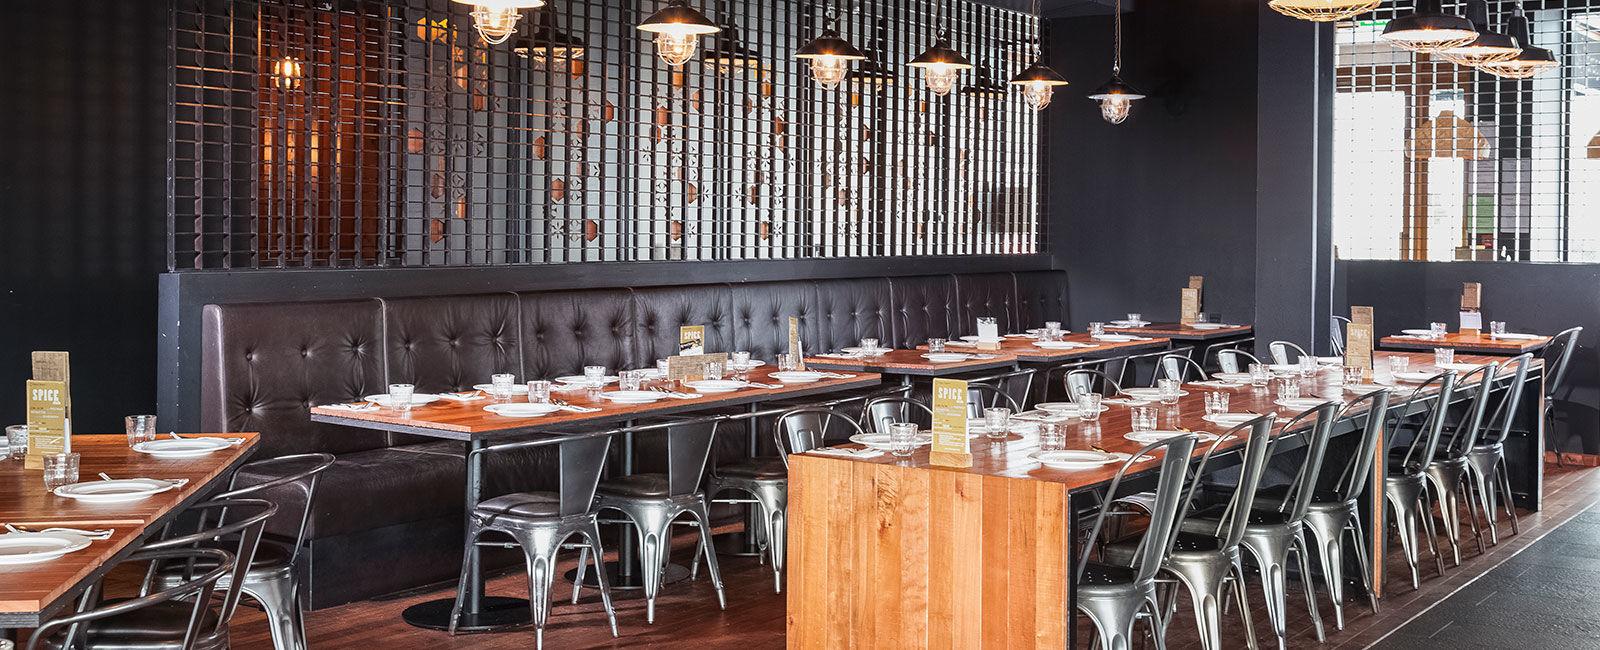 Spice Paragon Restaurant Furniture